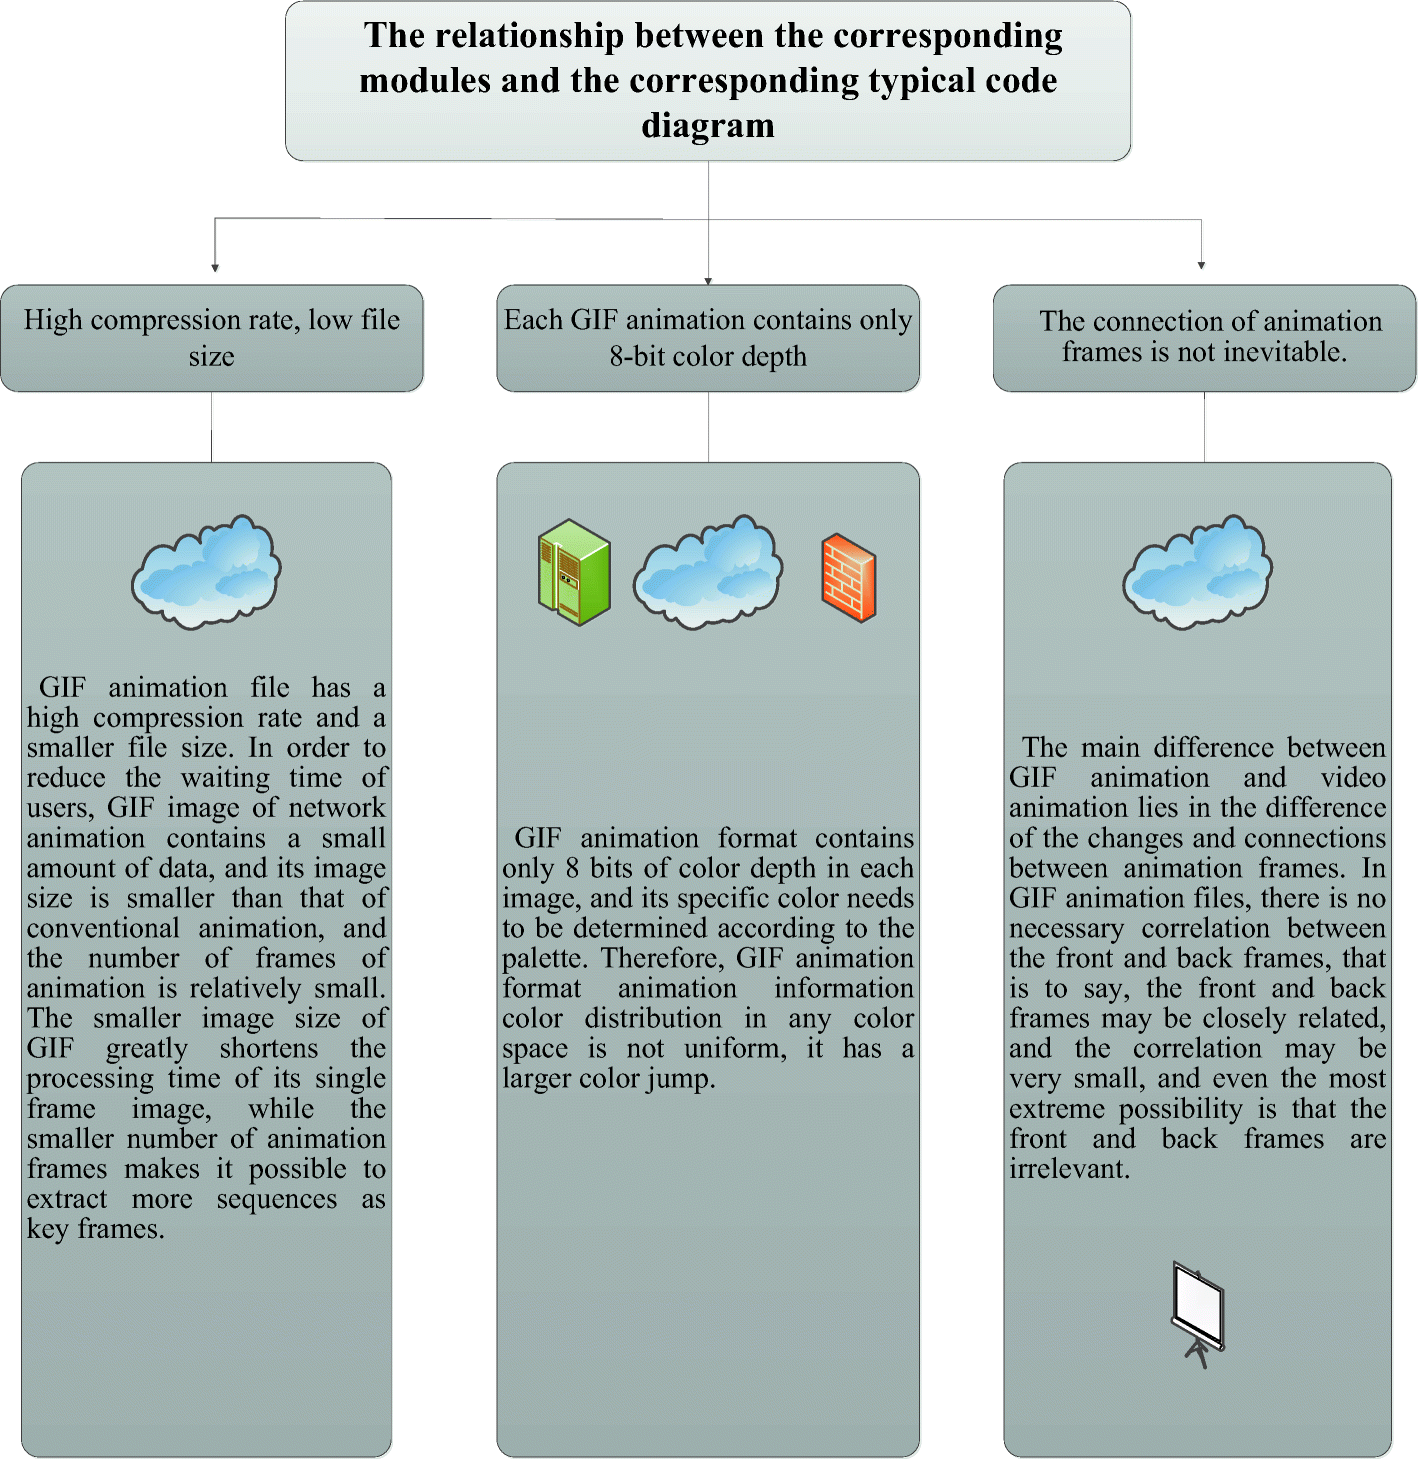 Multimedia animation filtering simulation based on image